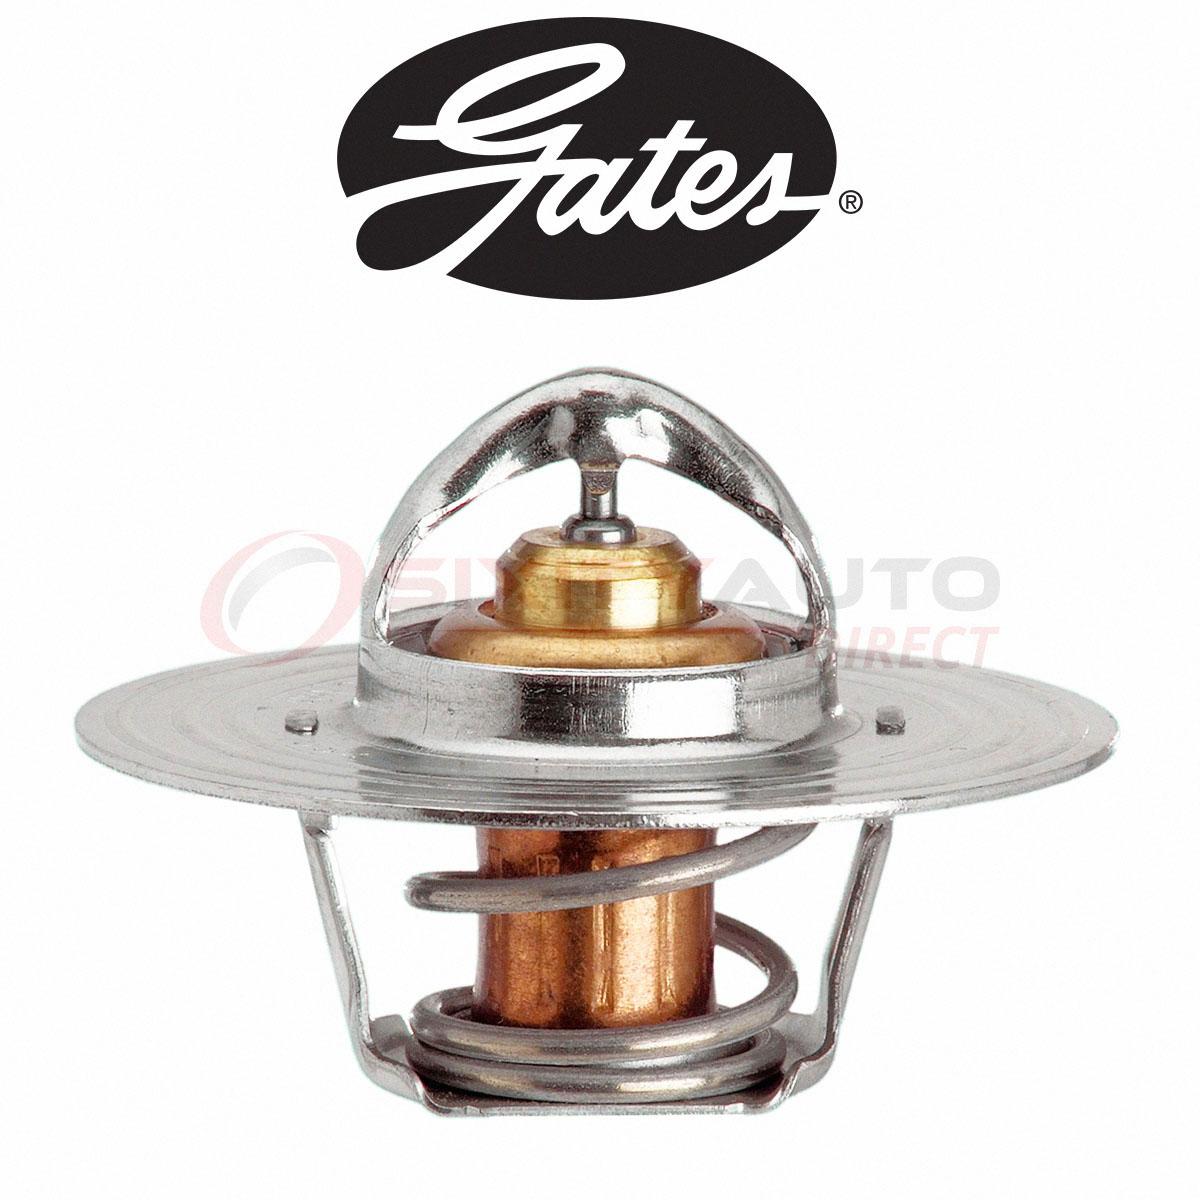 Gates Coolant Thermostat for 2007-2013 Chevrolet Silverado 2500 5.3L 4.8L V8 by